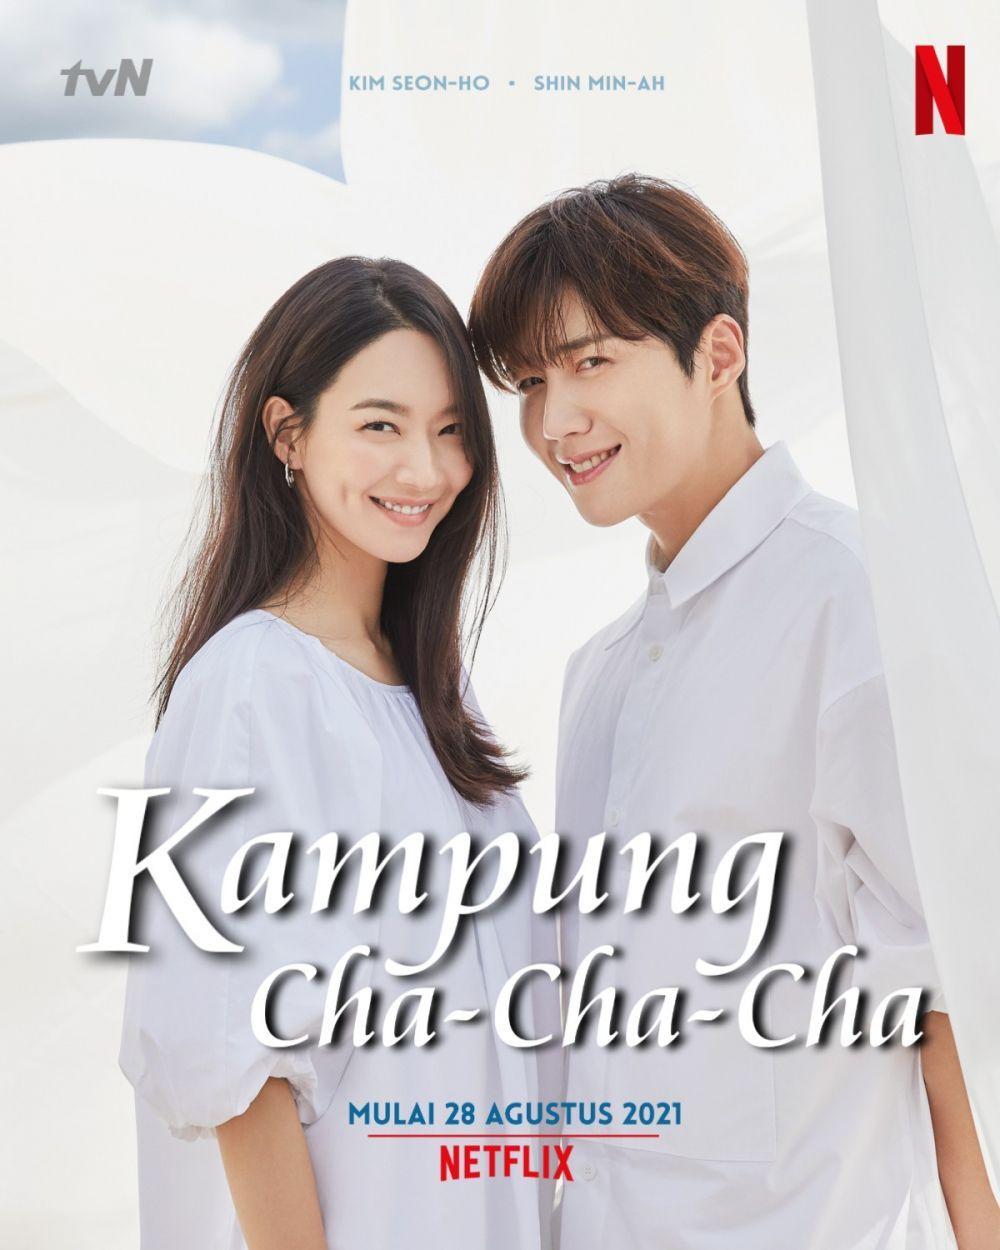 10 Poster Editan 'Hometown Cha-Cha-Cha' Ini Jadi a la FTV, Kocak!